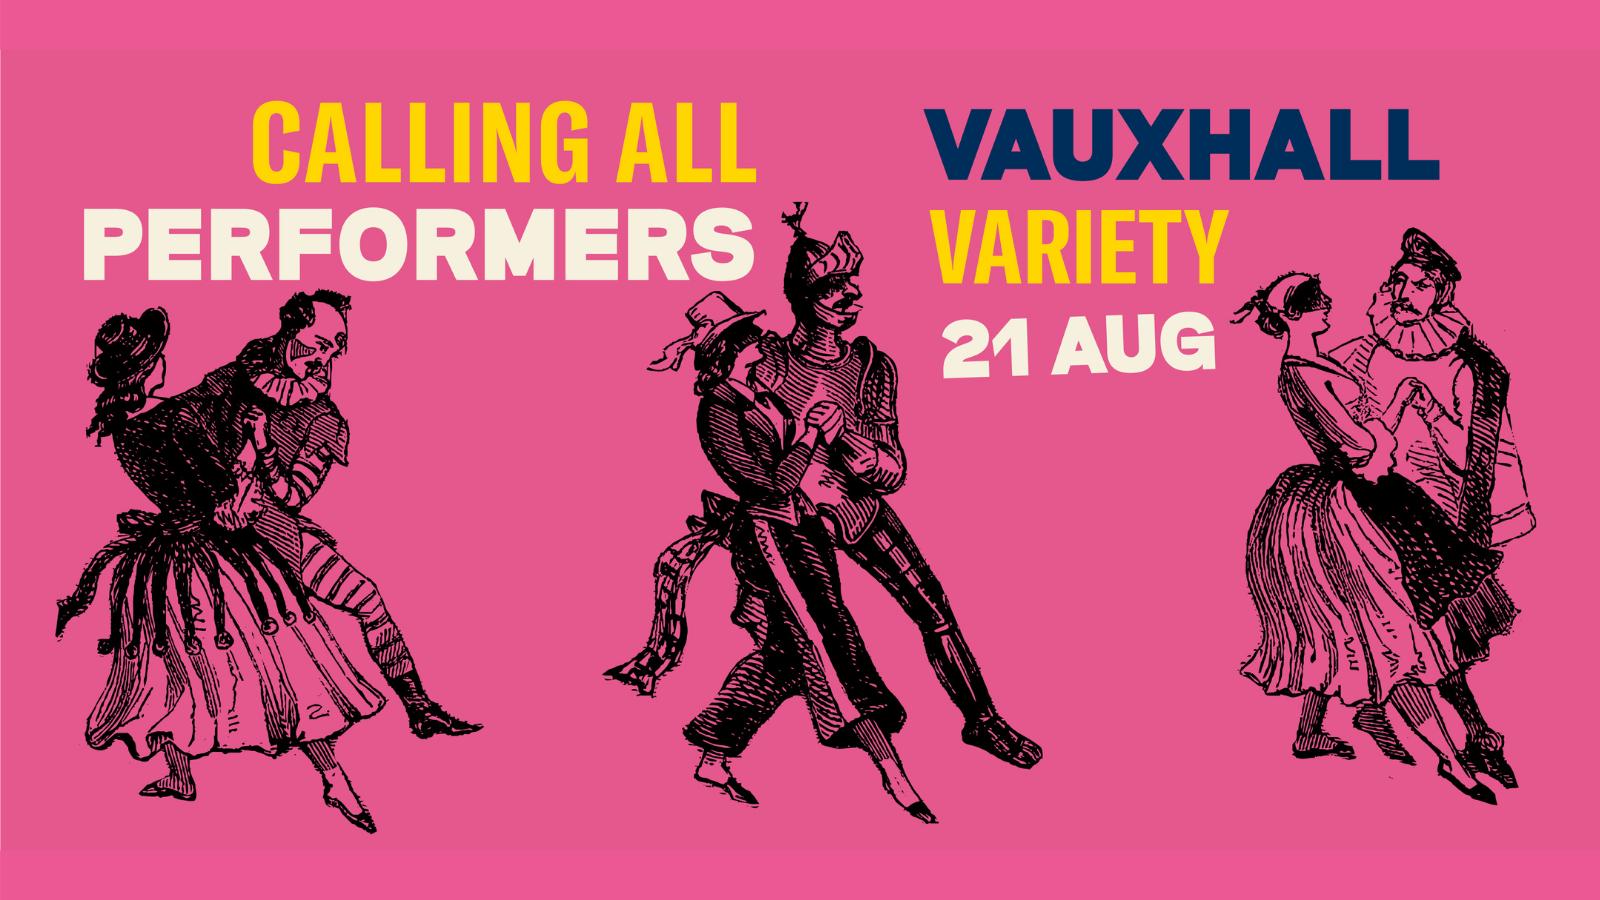 vauxhall variety